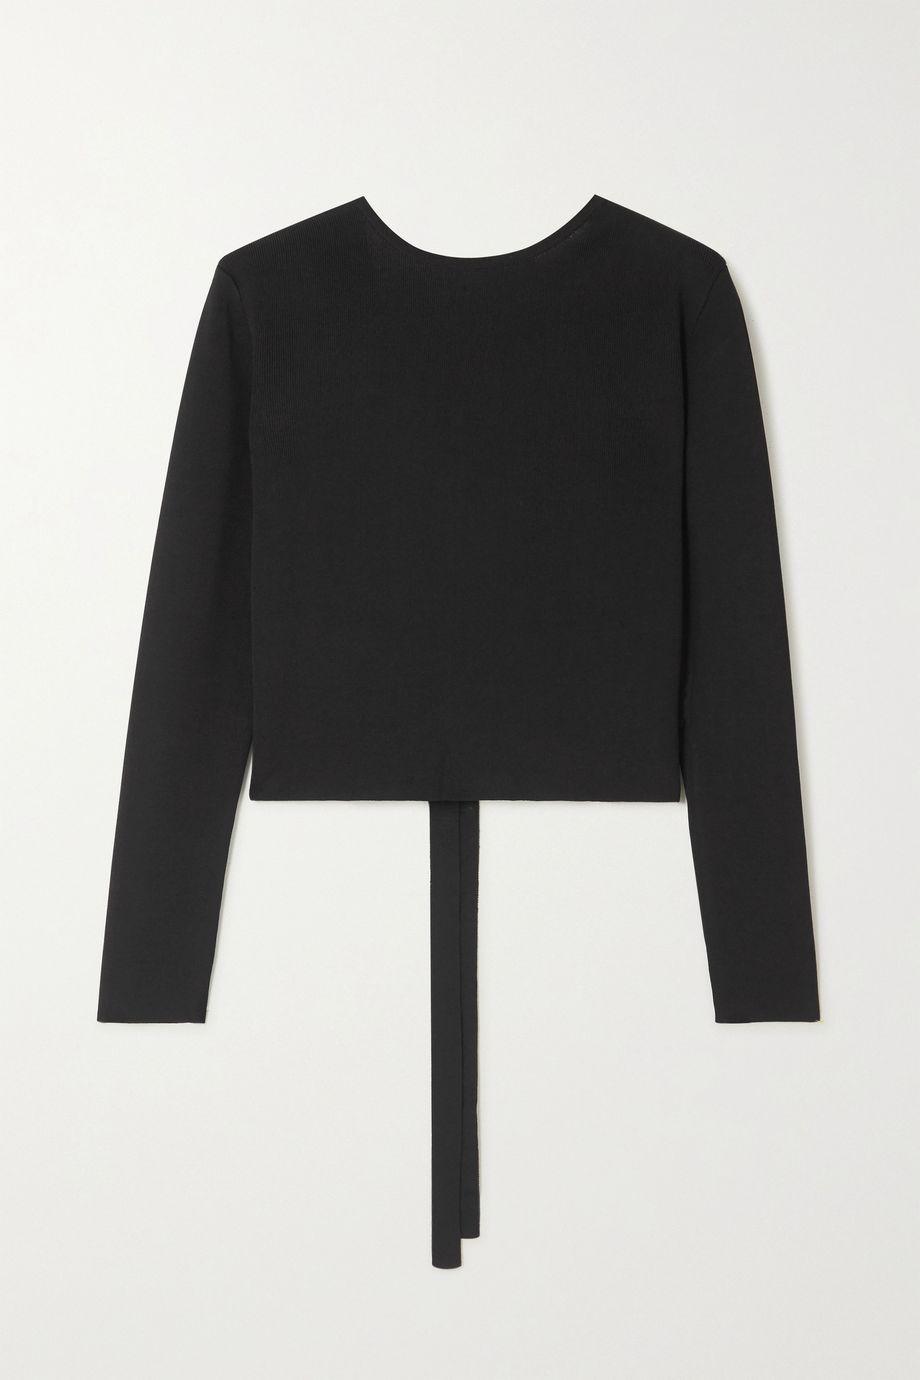 Matteau Tie-back stretch-knit top